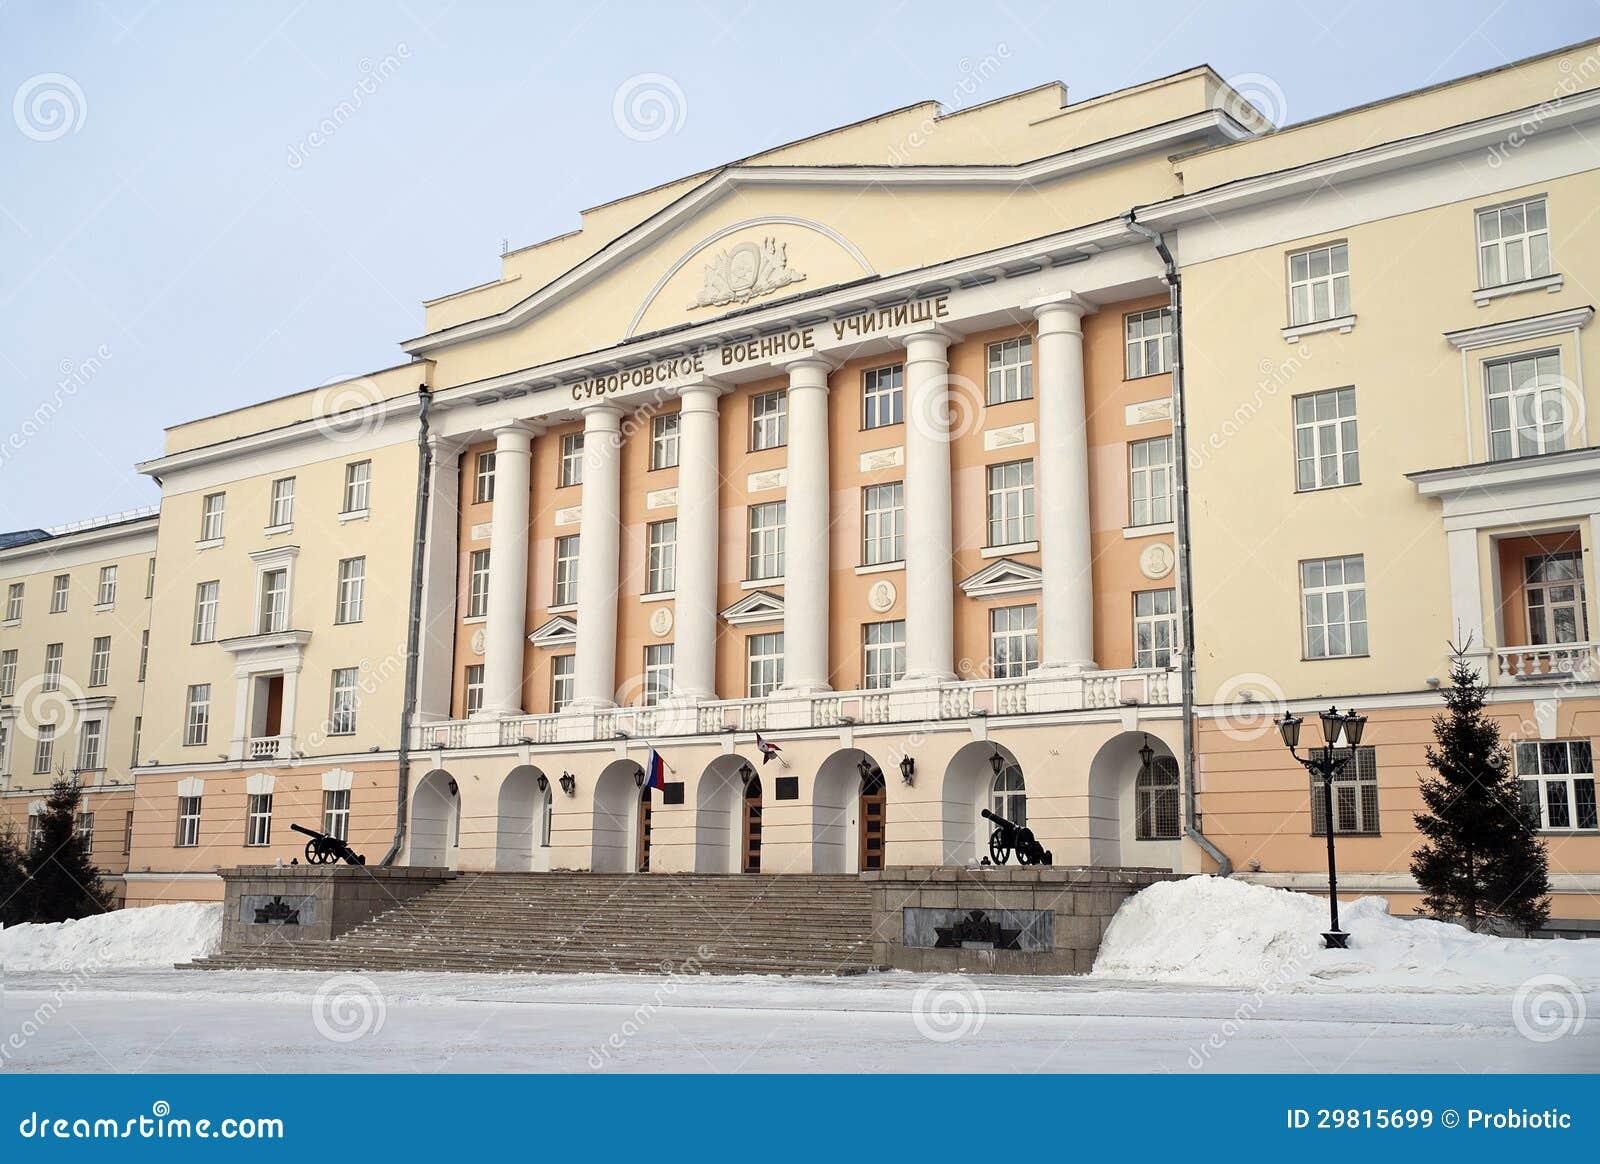 Military sanatorium of the Russian Defense Ministry in 2018 93